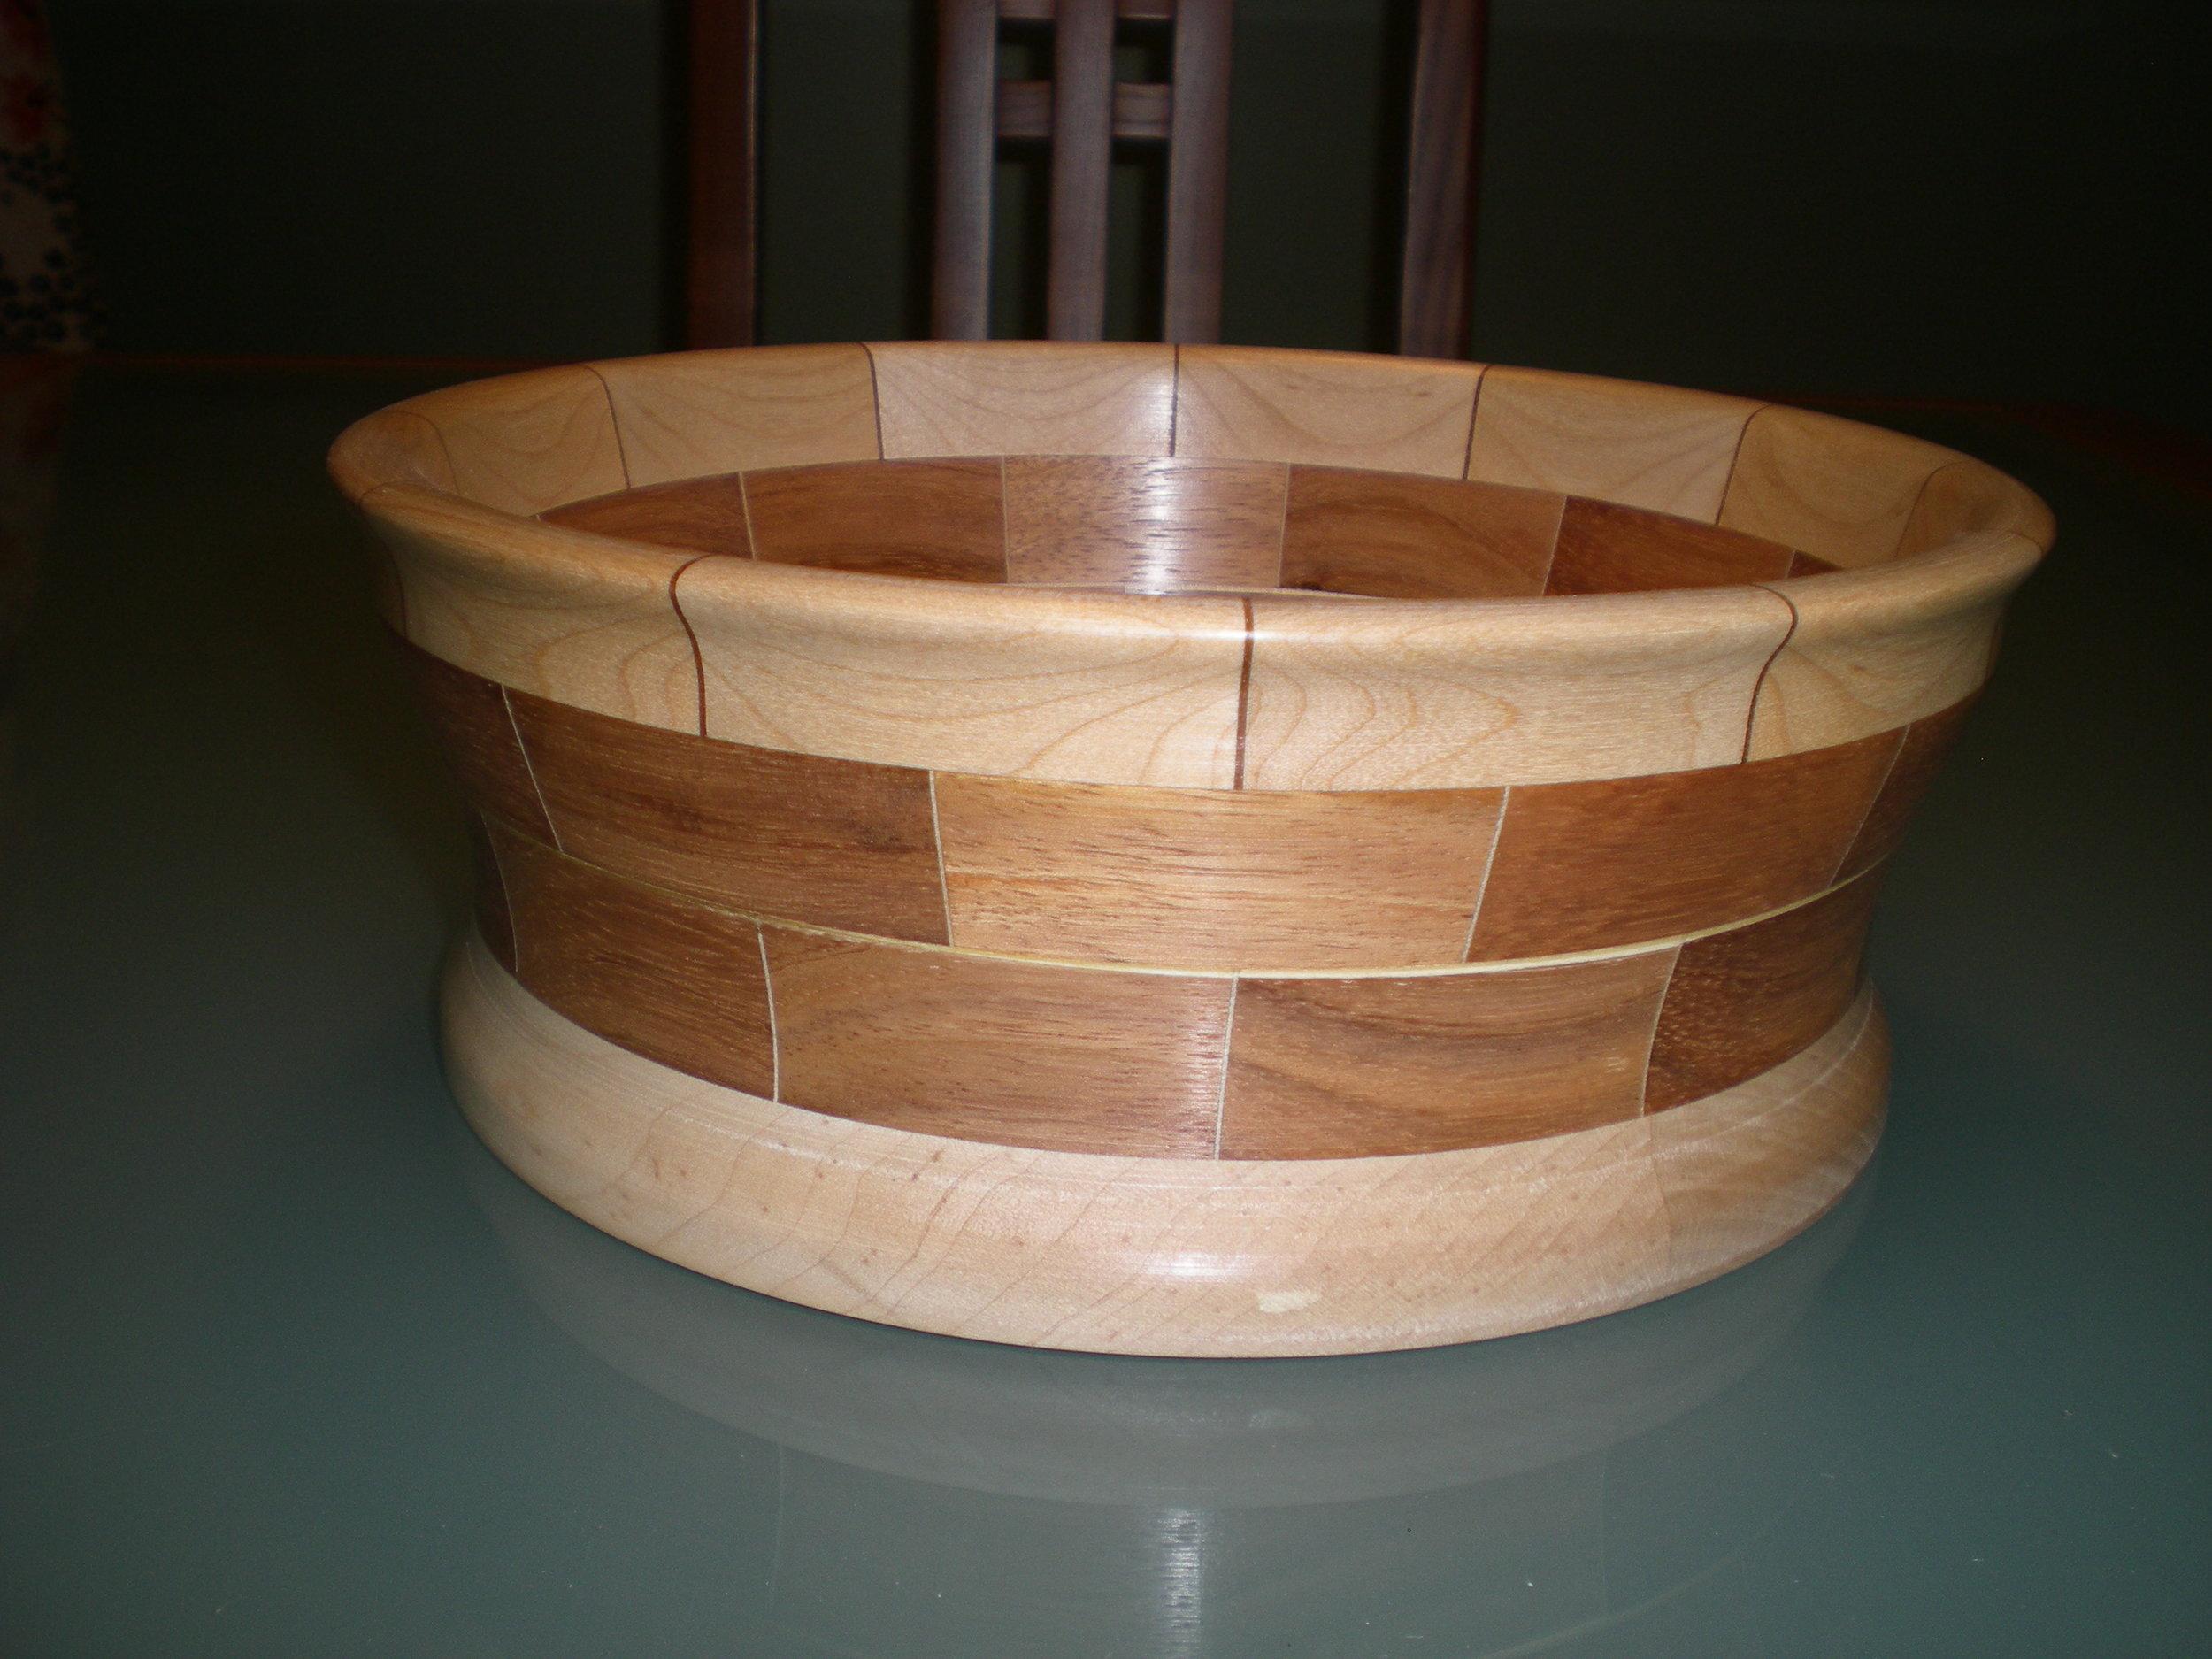 RJC Wood Creations - Bowls (39).JPG